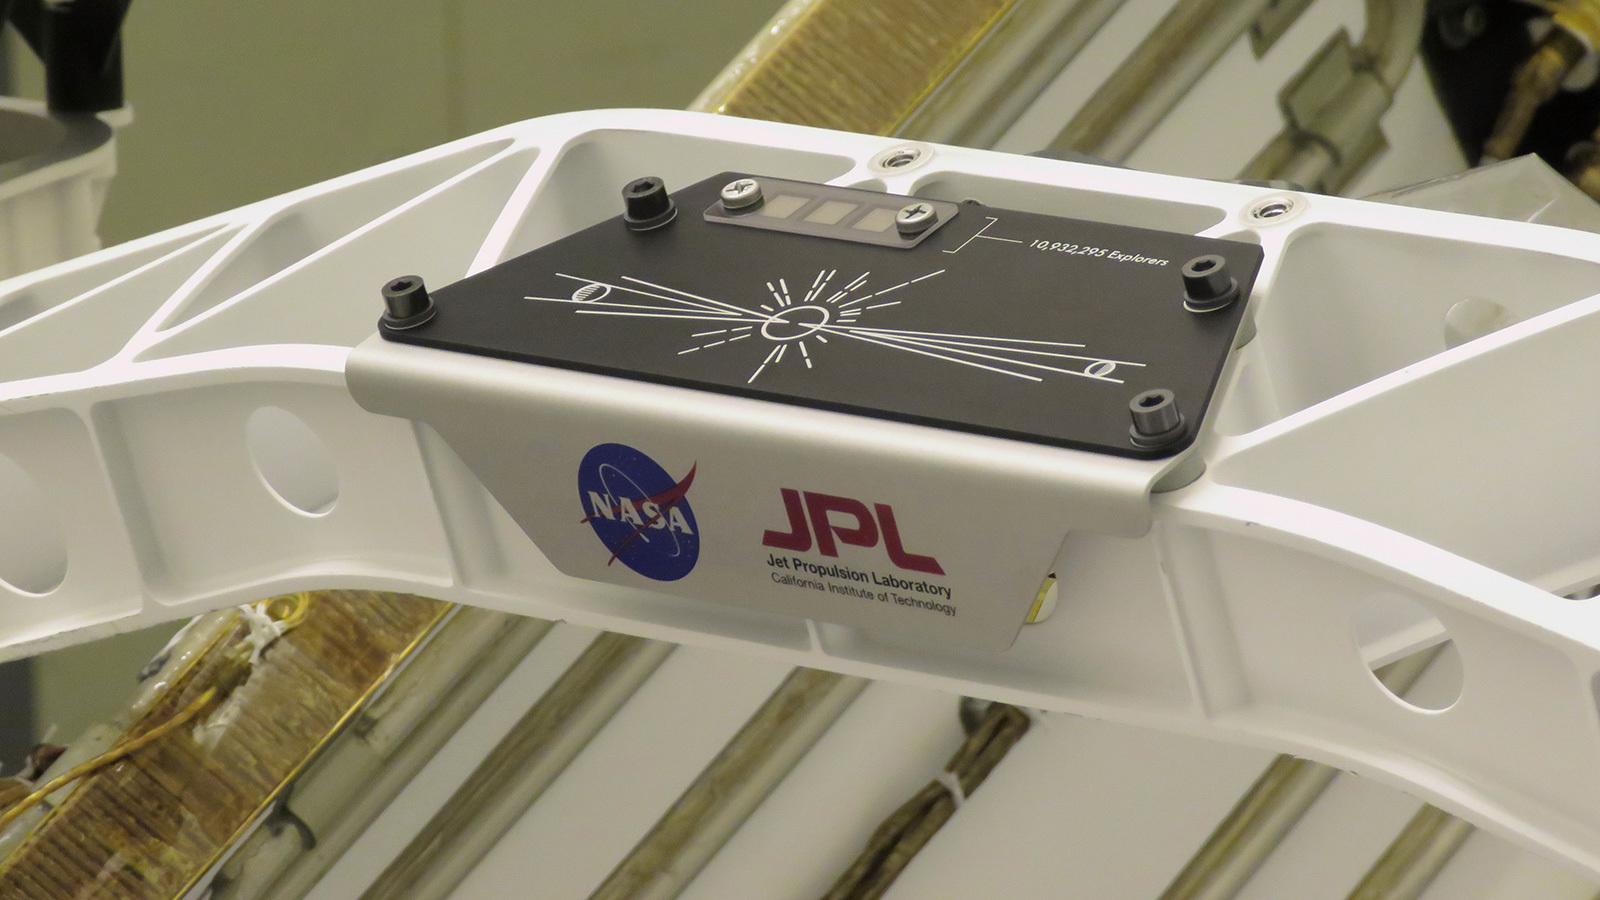 A placard commemorating NASA's